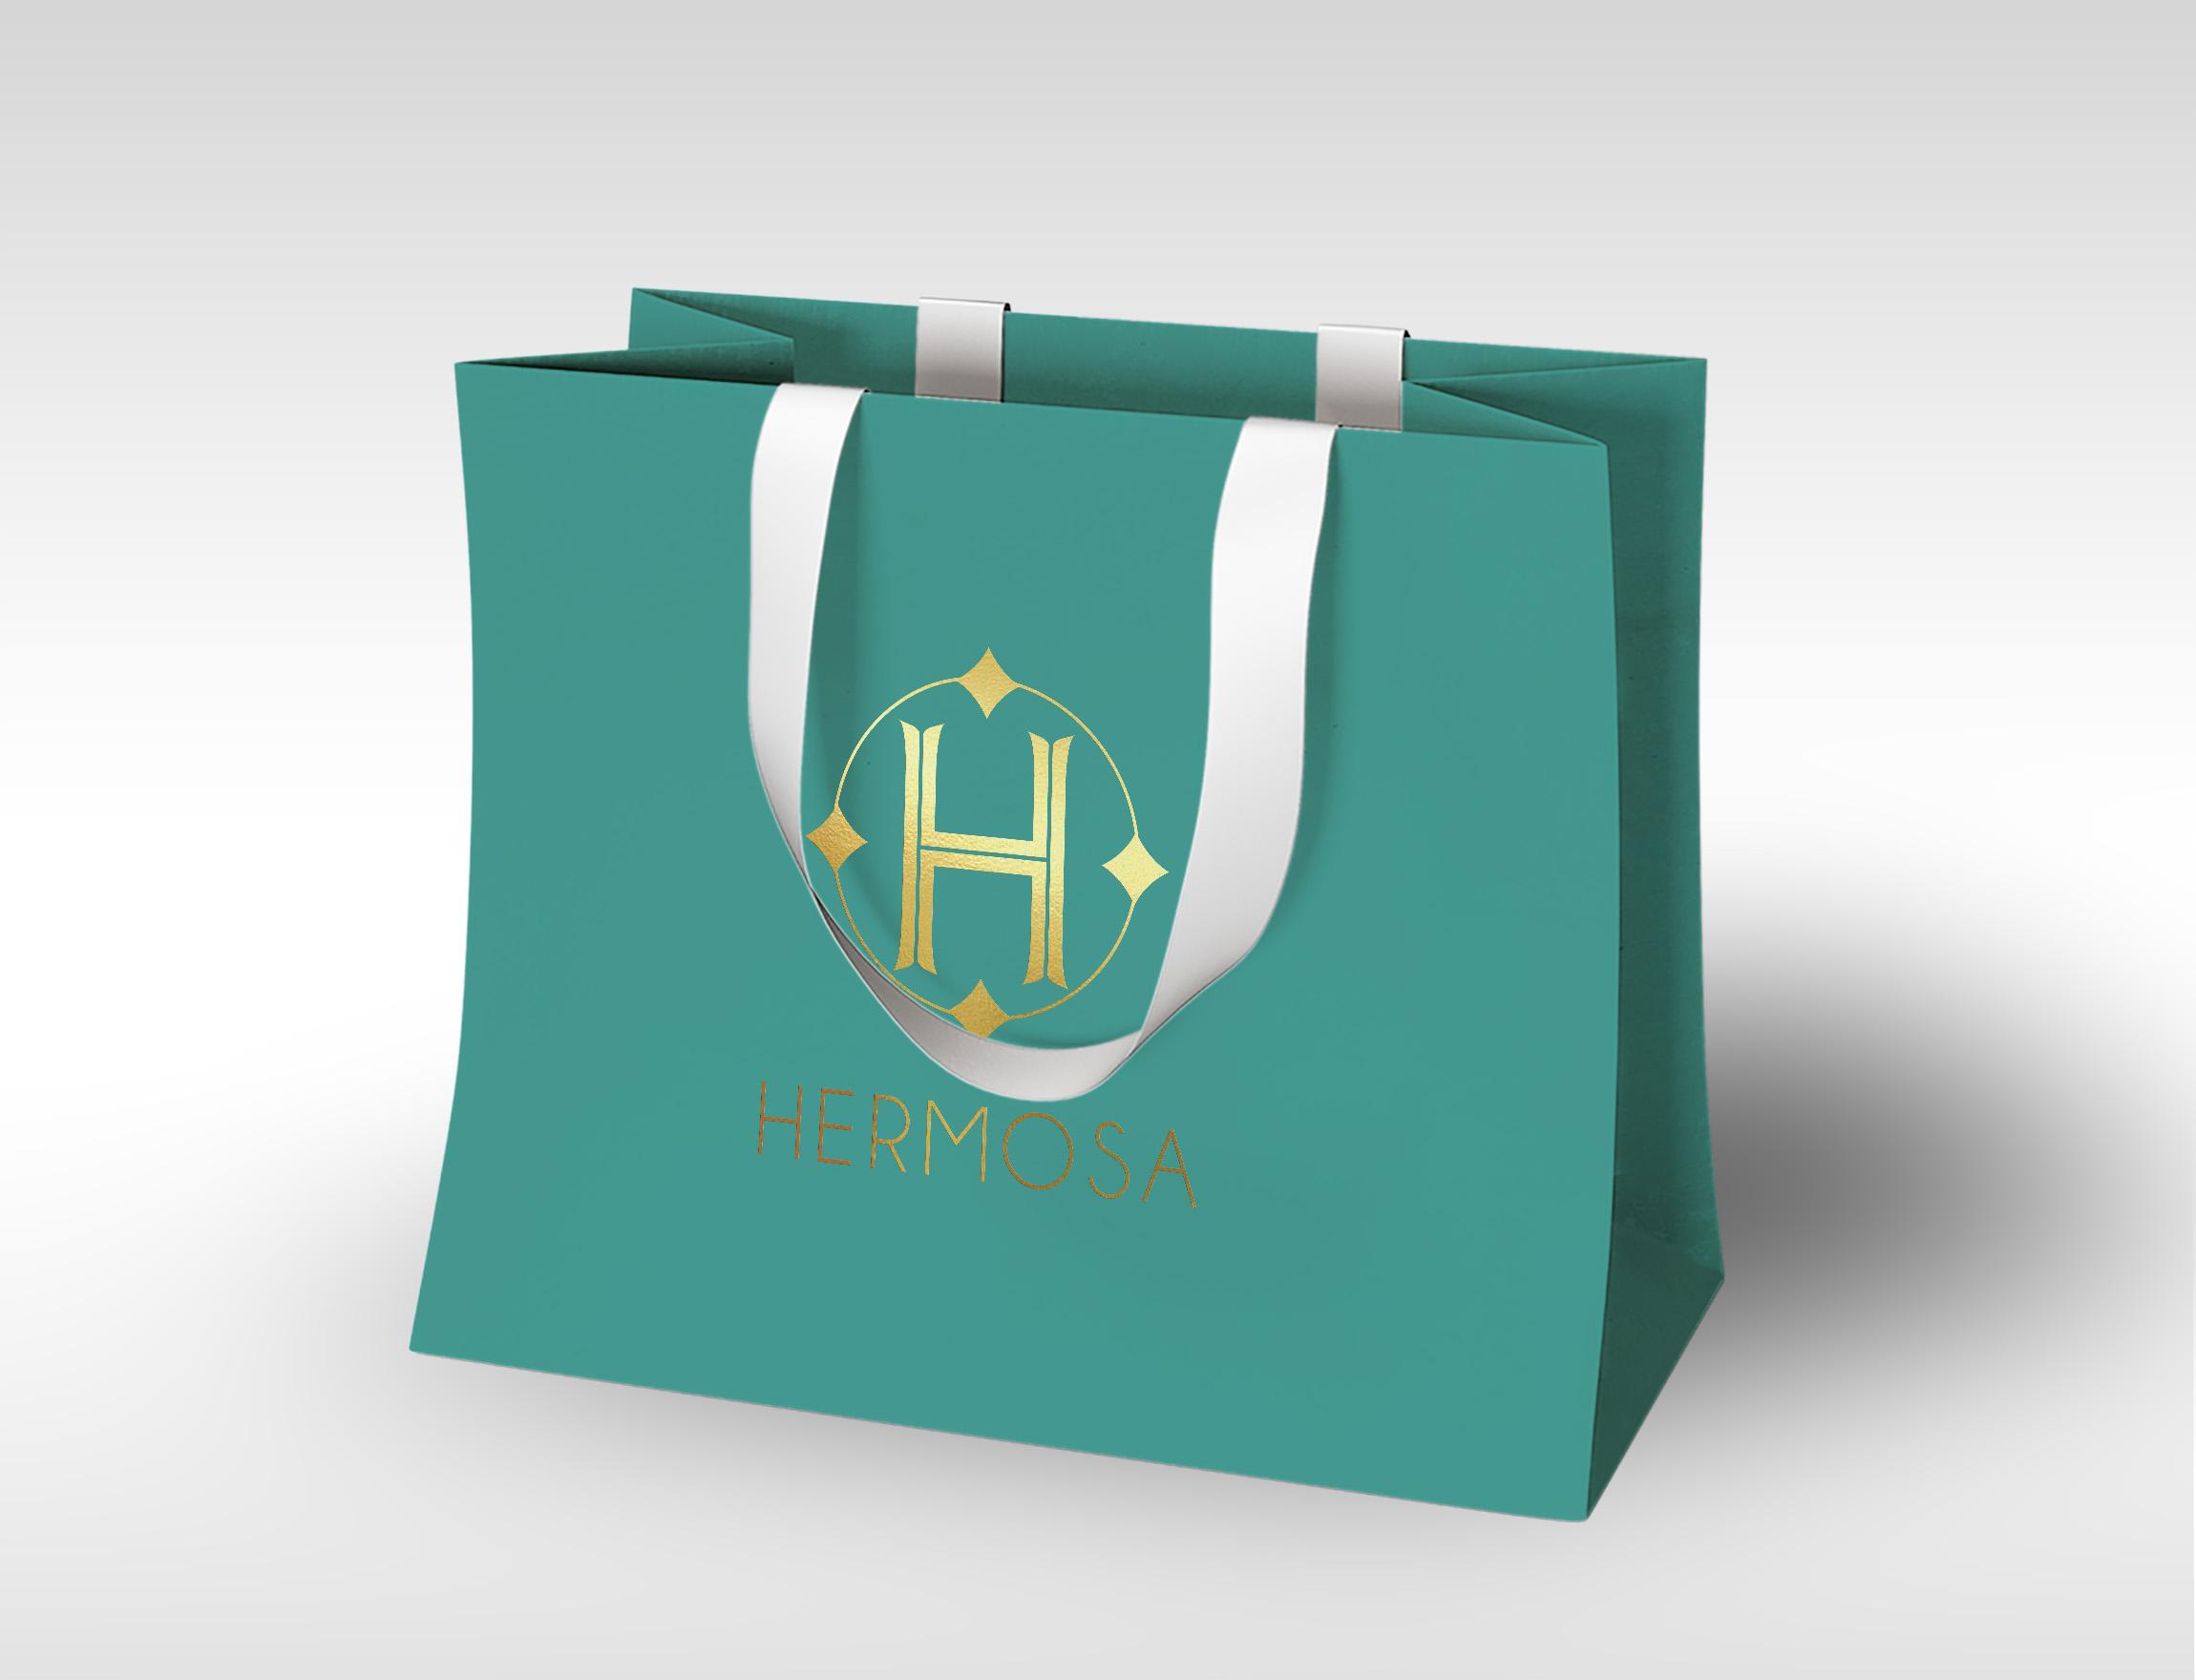 hermosa bag.jpg